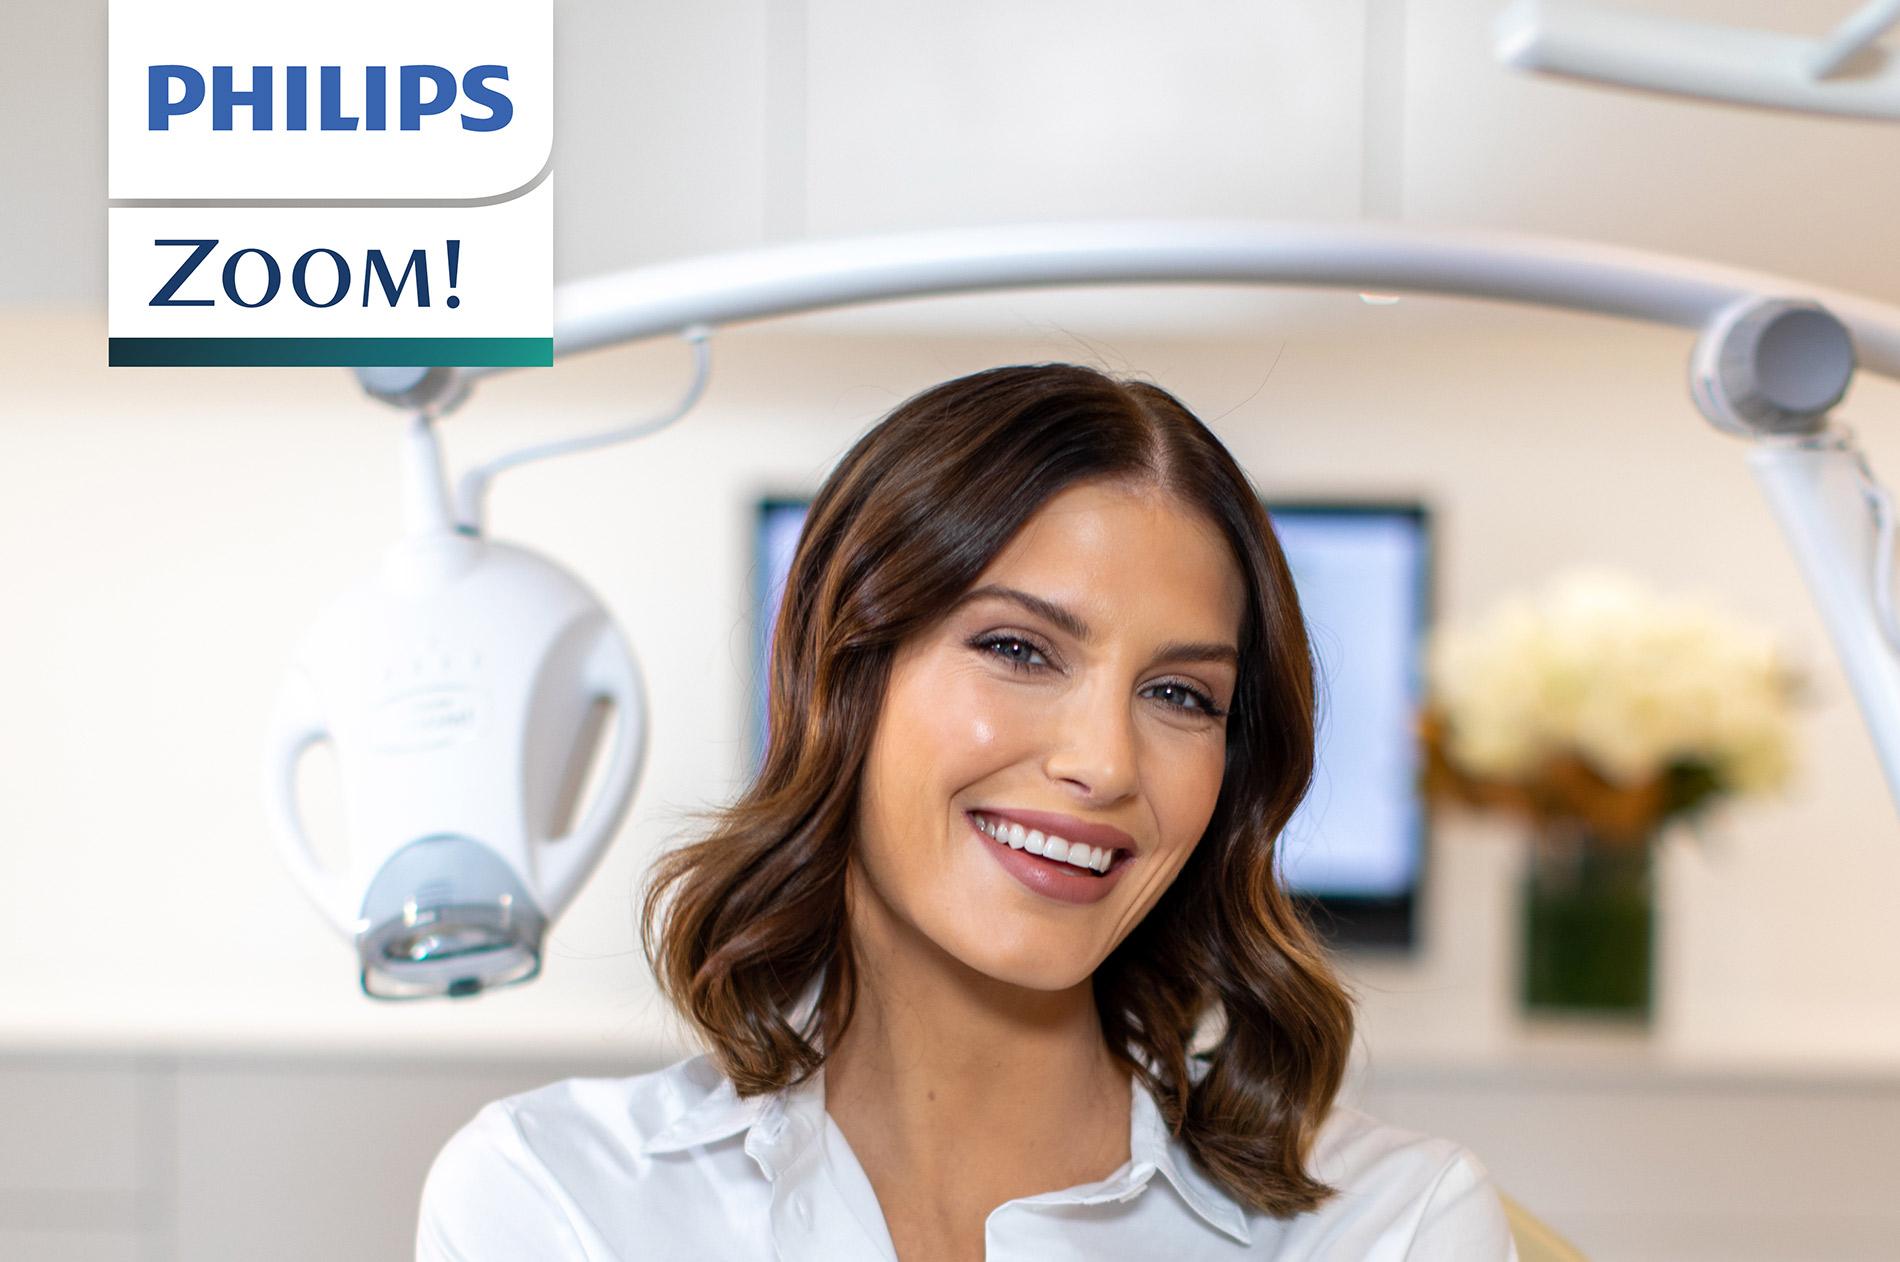 Zoom teeth whitening at TFI Dentistry Gold Coast 07 5528 8222